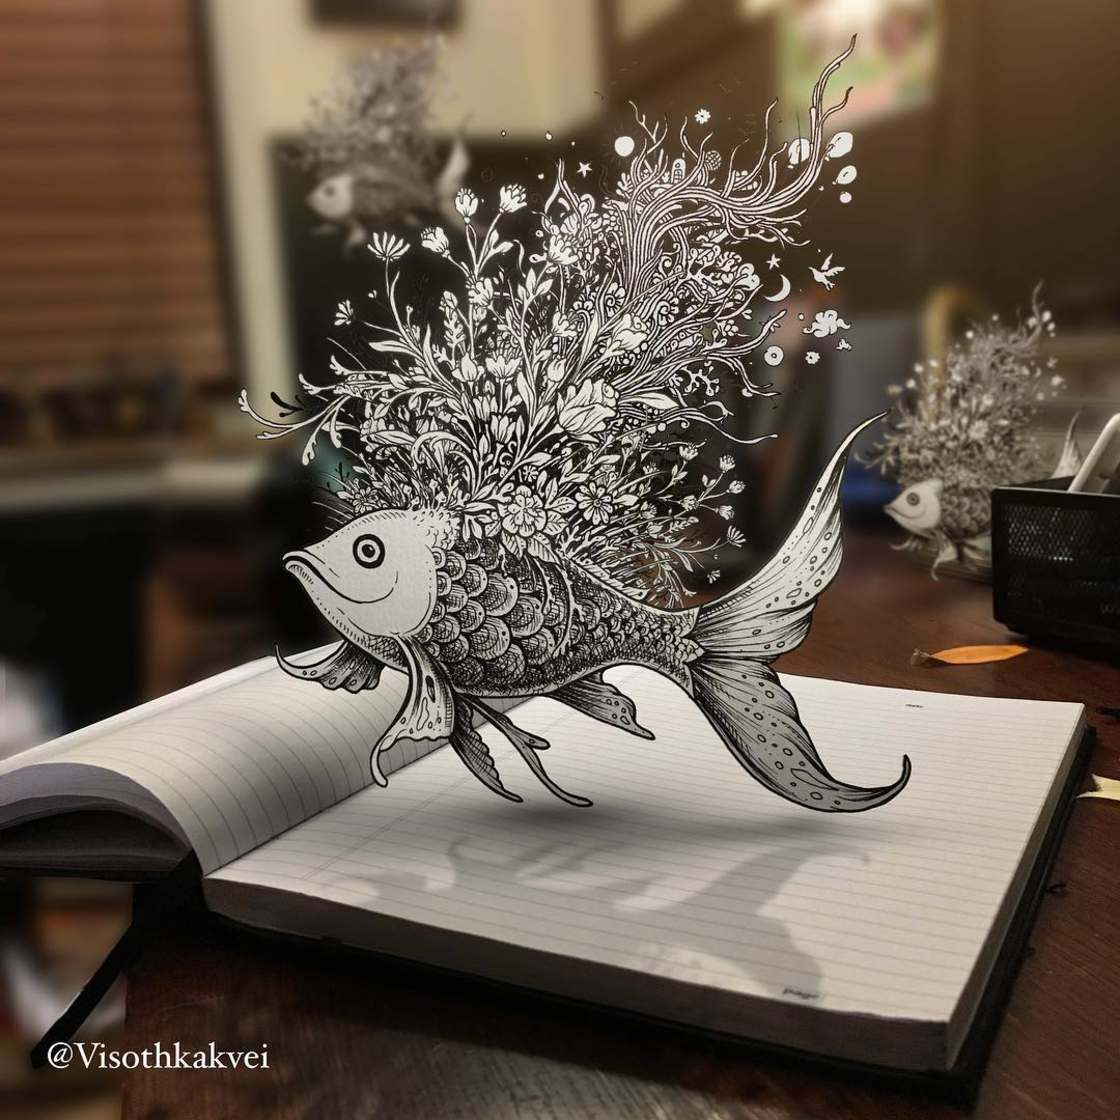 Les superbes doodles augmentes de Visothkakvei (15 pics)